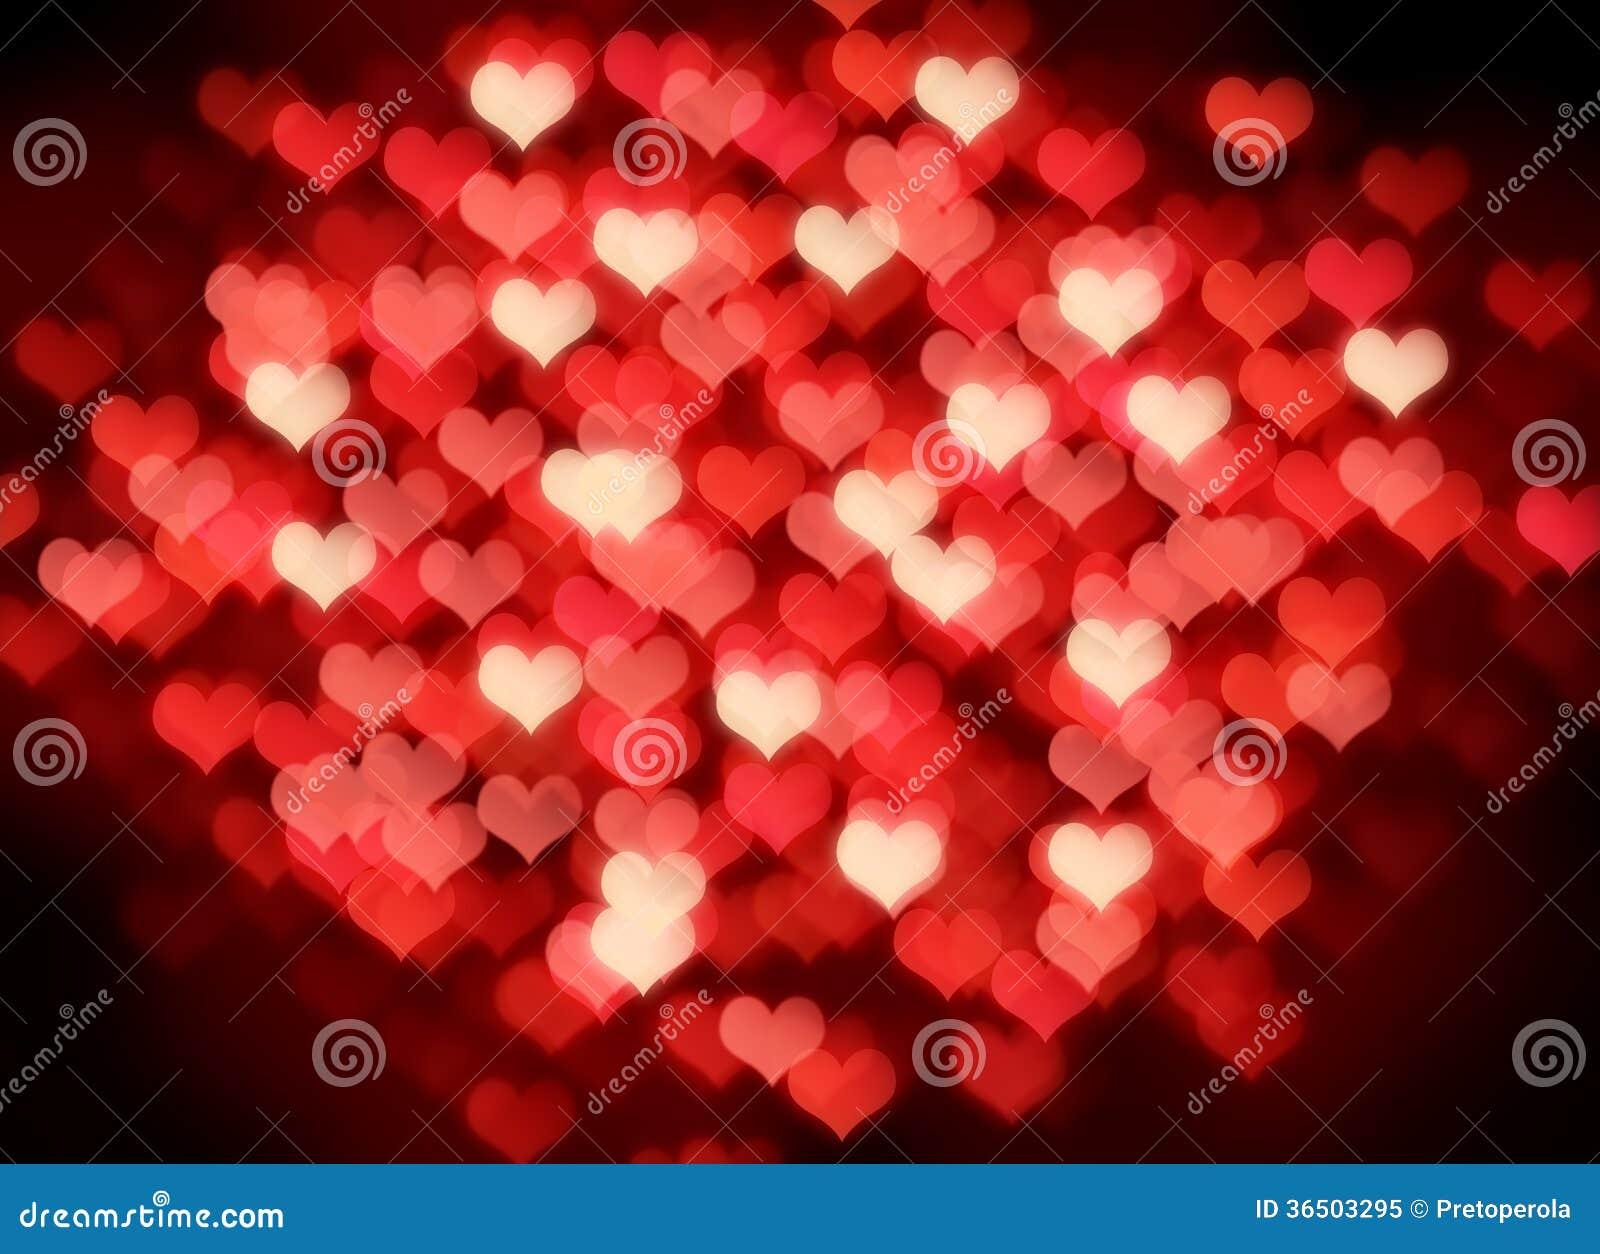 Fond de Saint-Valentin